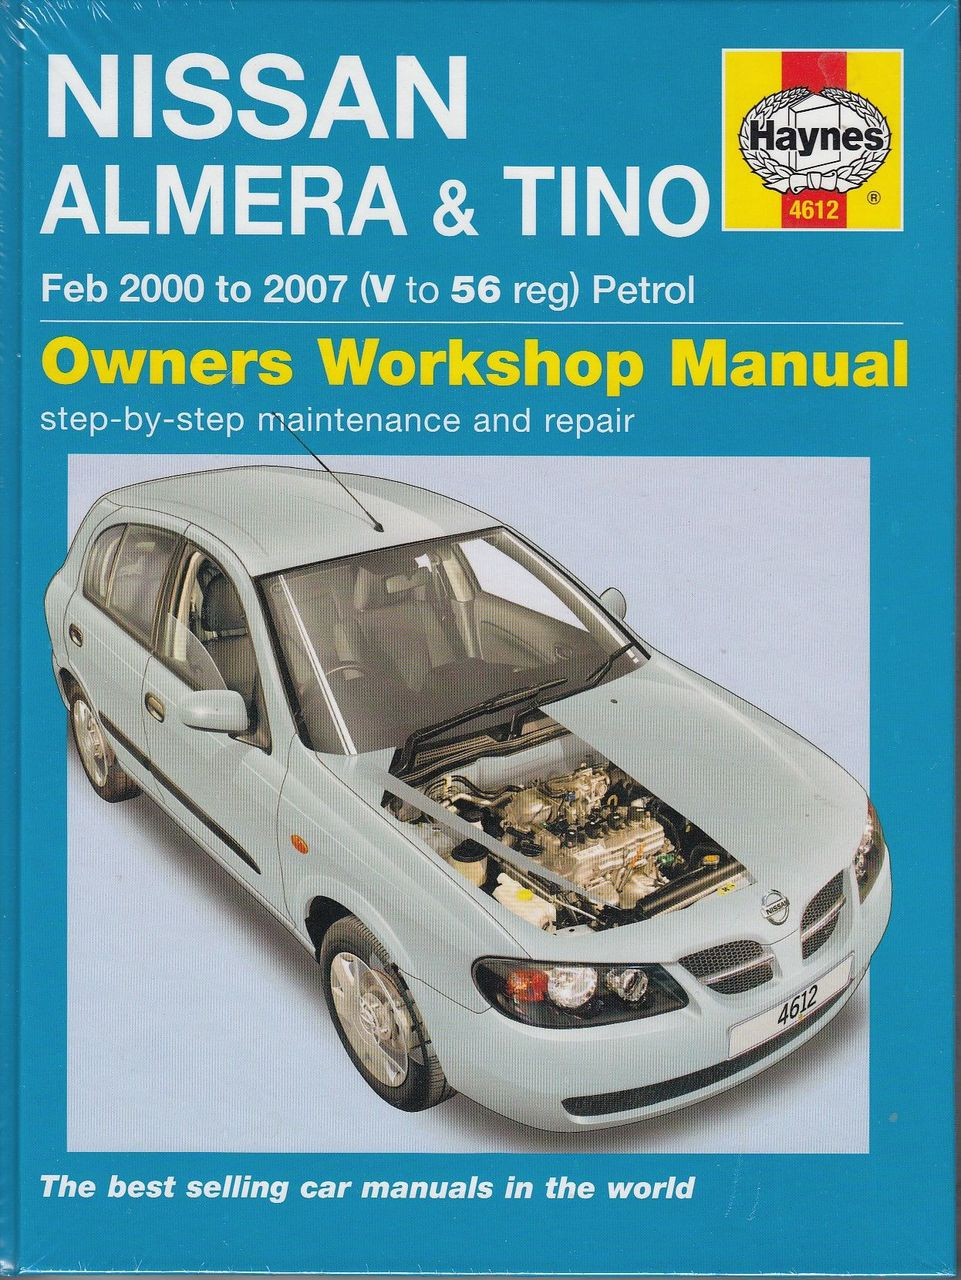 nissan almera tino 1 5 1 8 litre petrol 2000 2007 workshop manual rh automotobookshop com au 2016 Nissan Sentra 2014 Nissan Sentra